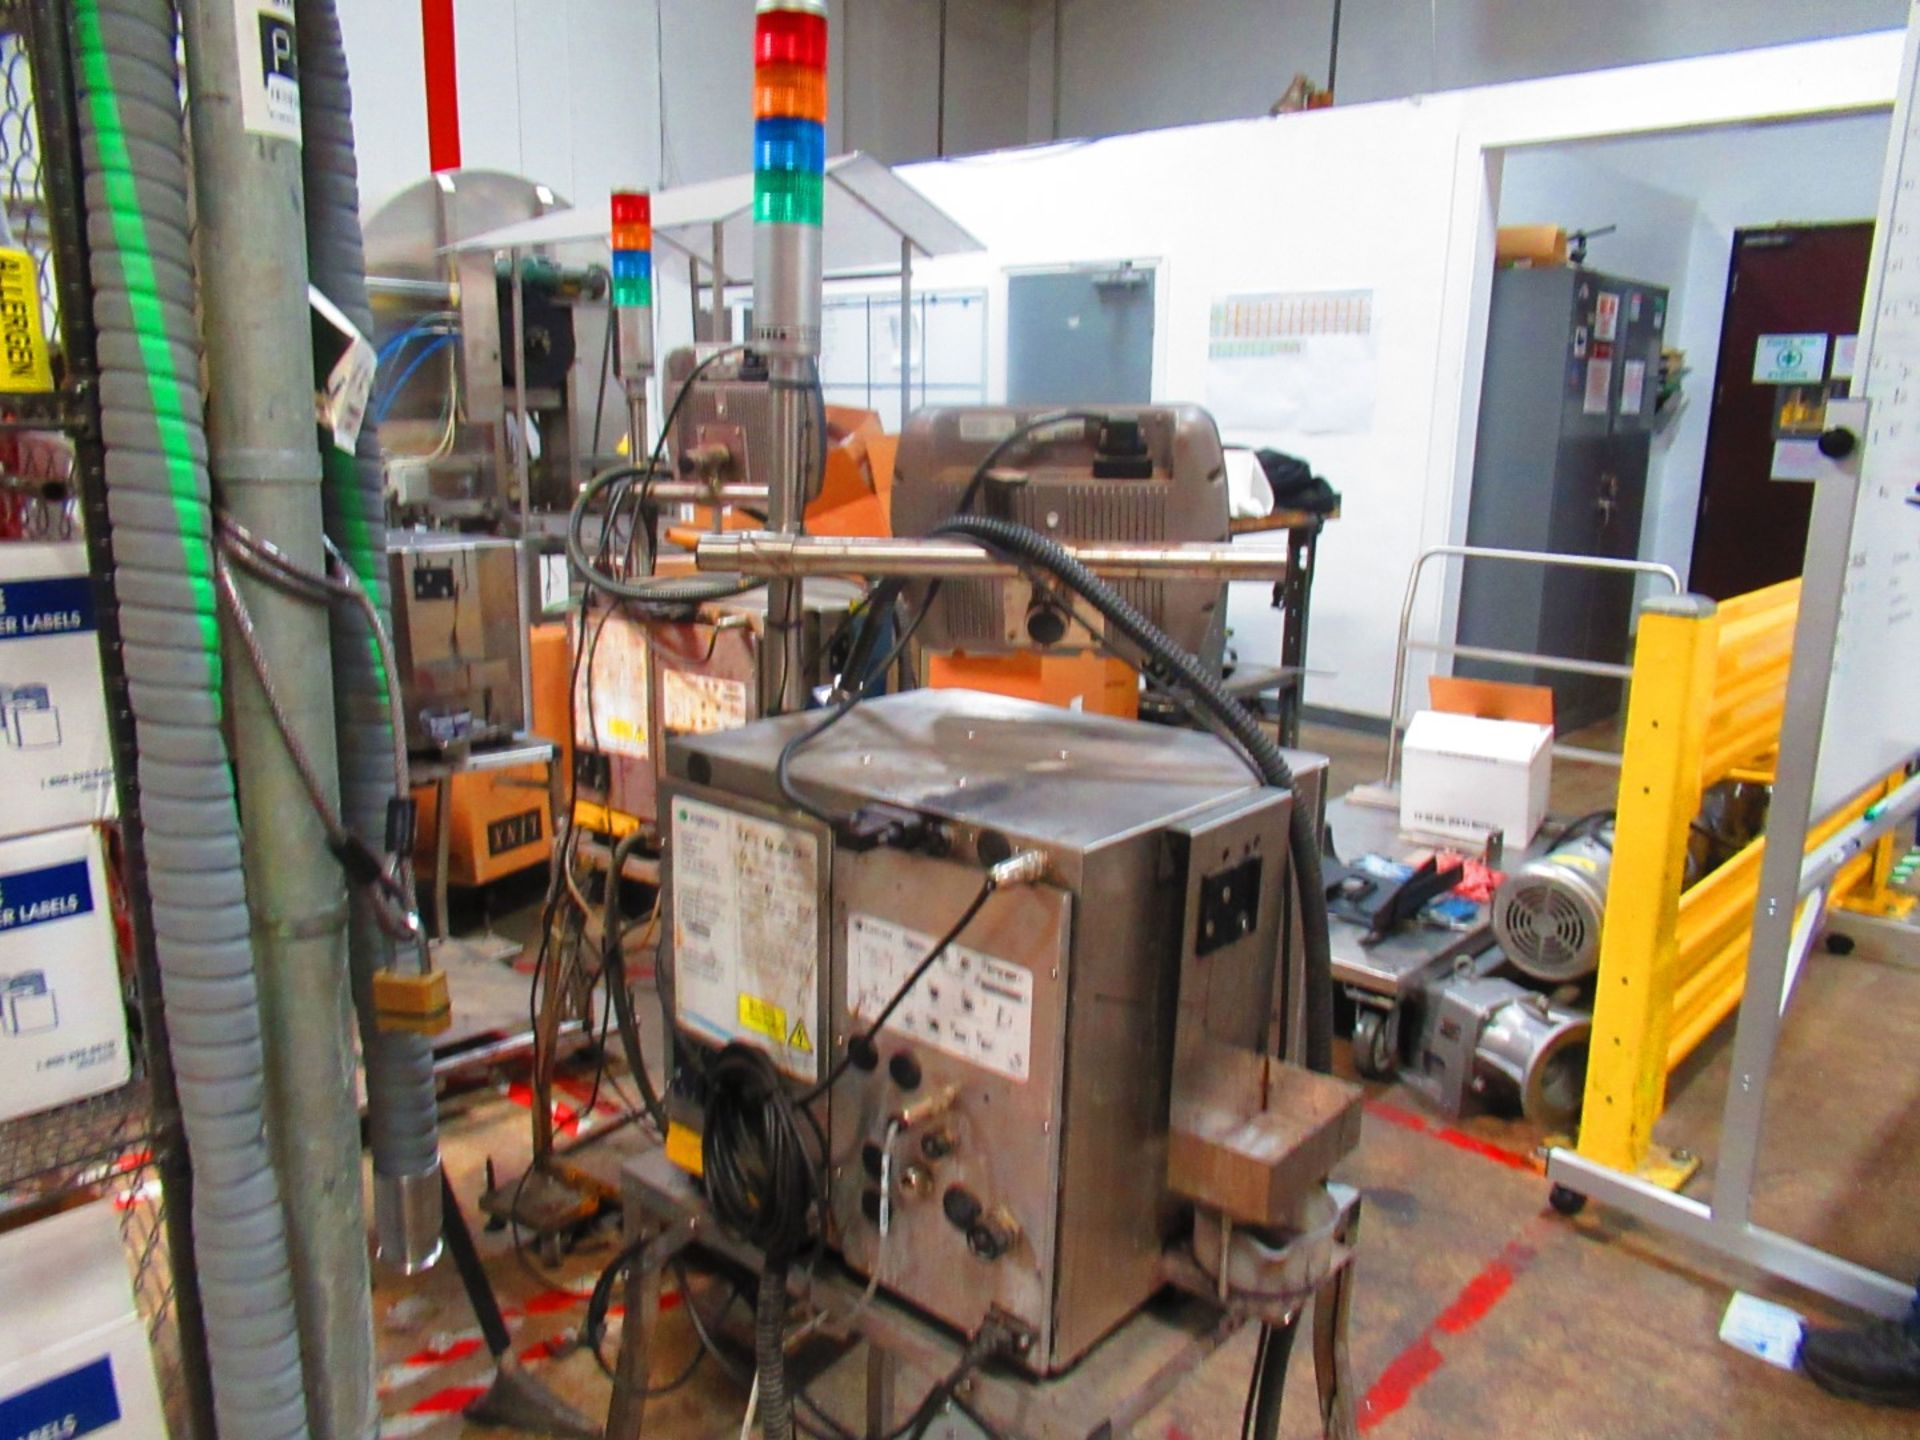 Thermal Printer - Image 2 of 8